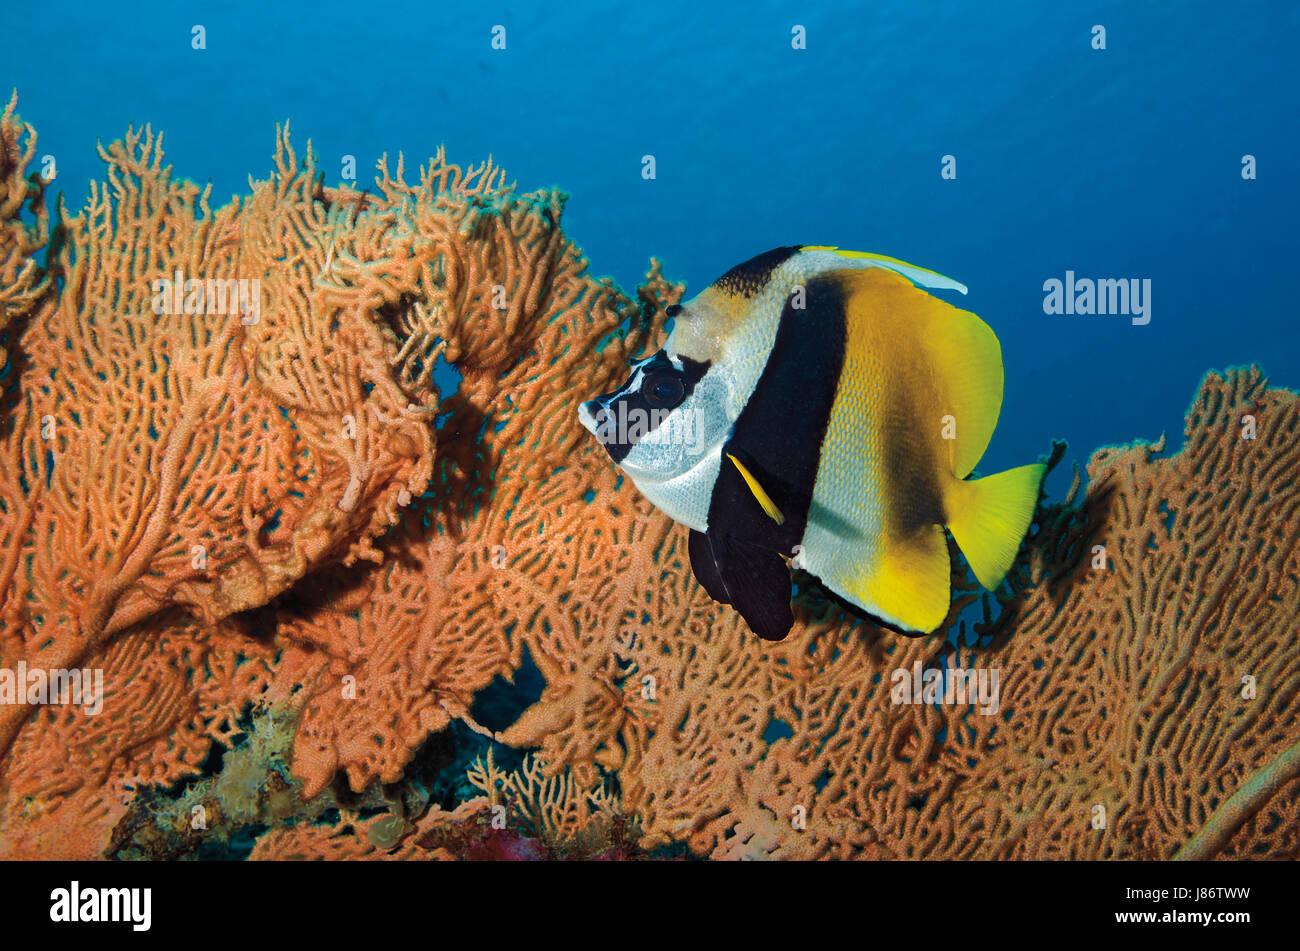 Masked bannerfish, Heniochus monoceros, against fan coral in Maldives, Indian Ocean - Stock Image